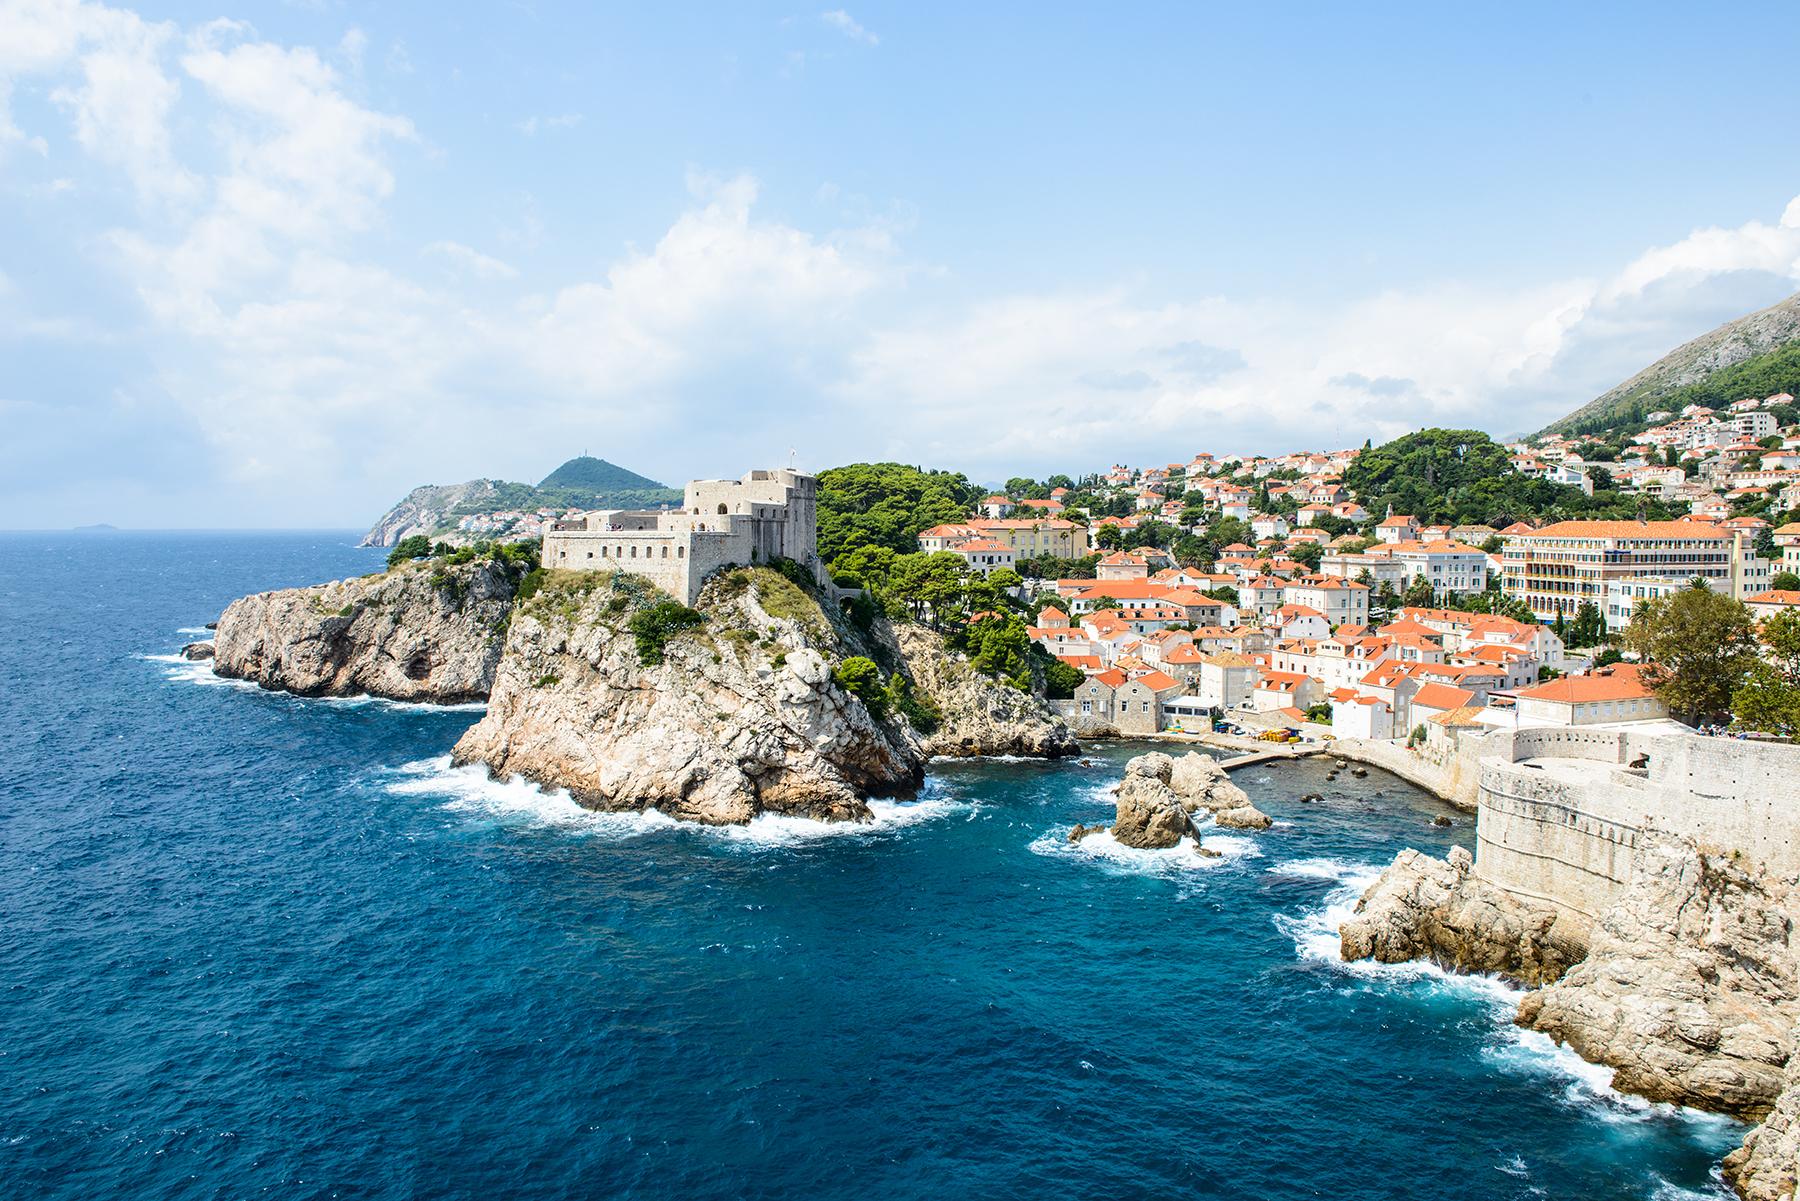 AHI_Adriatic_SHS_212947780_Dubrovnik.jpg